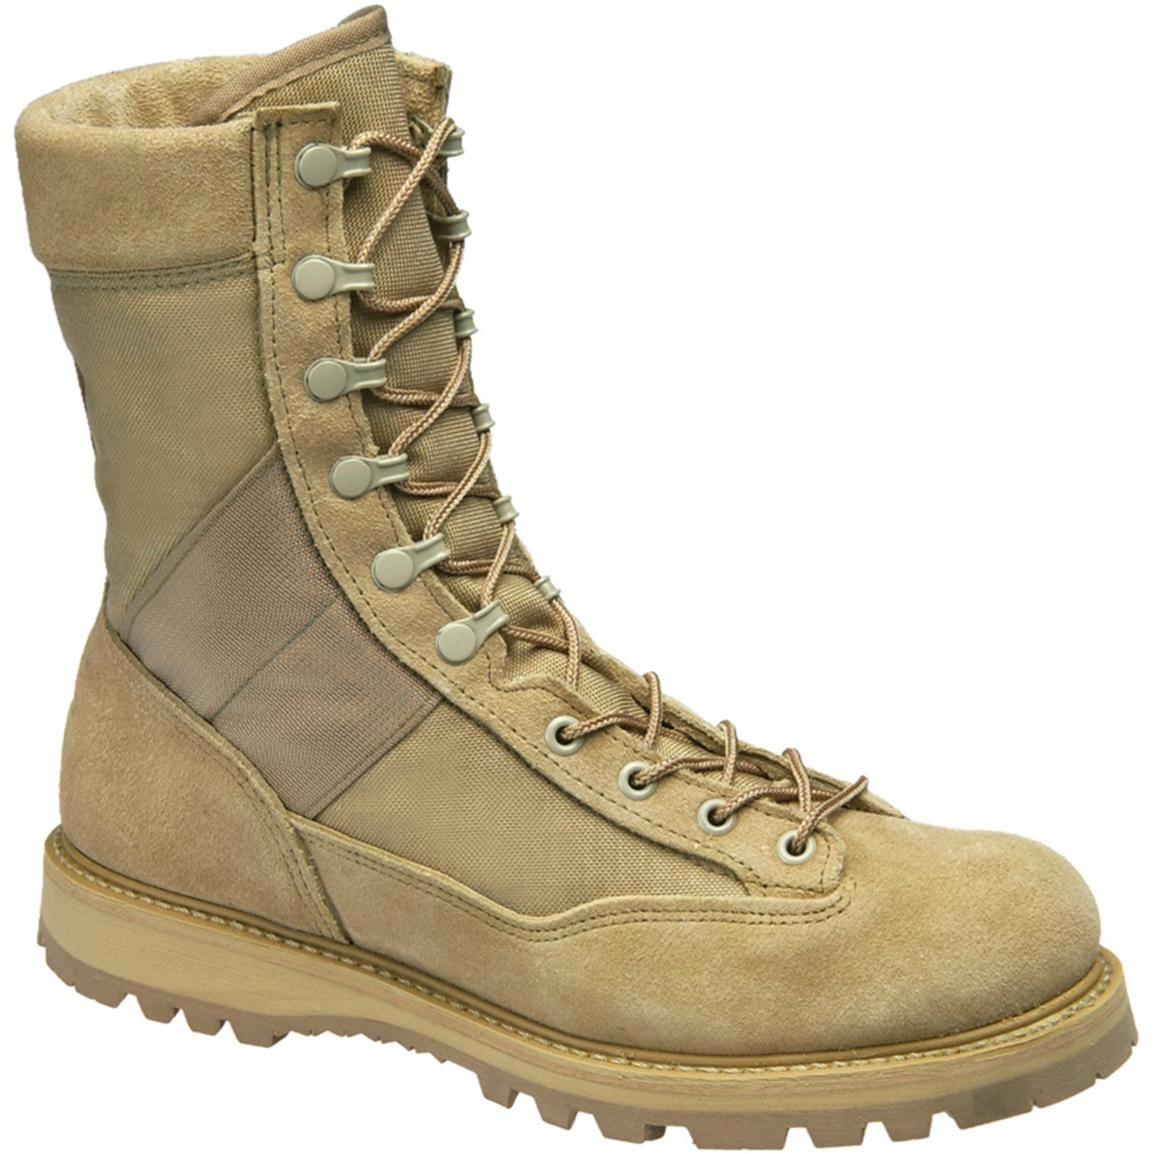 Desert Combat Boots By Corcoran 367018 Combat Tactical Boots At Sportsman S Guide Desert Combat Boots Combat Boots Military Combat Boots